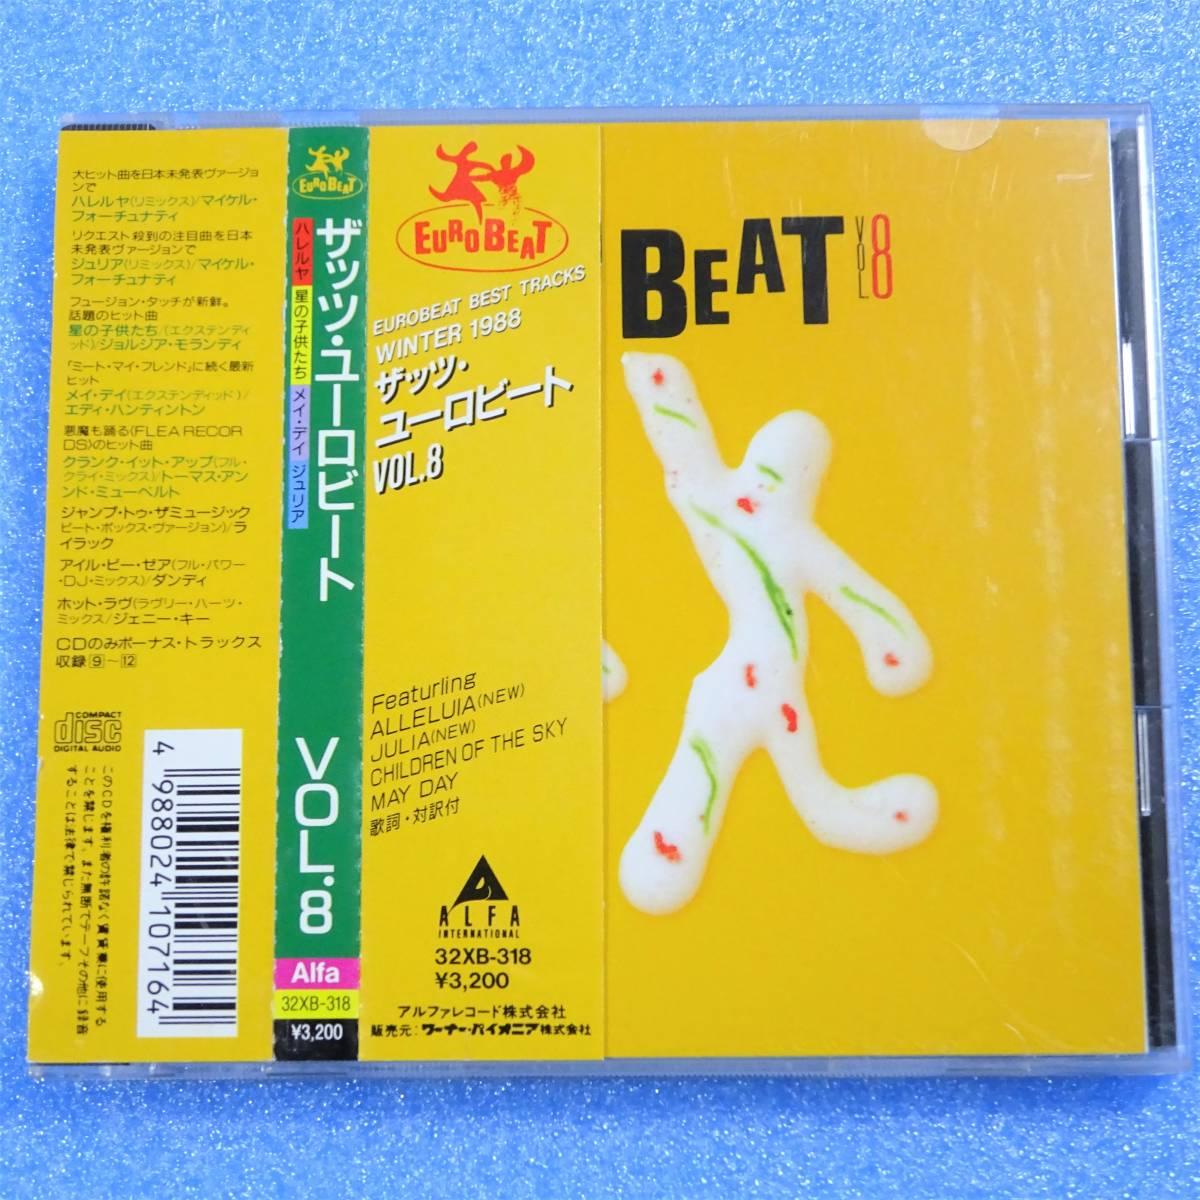 CD ザッツ・ユーロビート THAT'S EUROBEAT Vol.8 1988年 ディスコ ユーロビート マイケル・フォーチュナティ_画像1